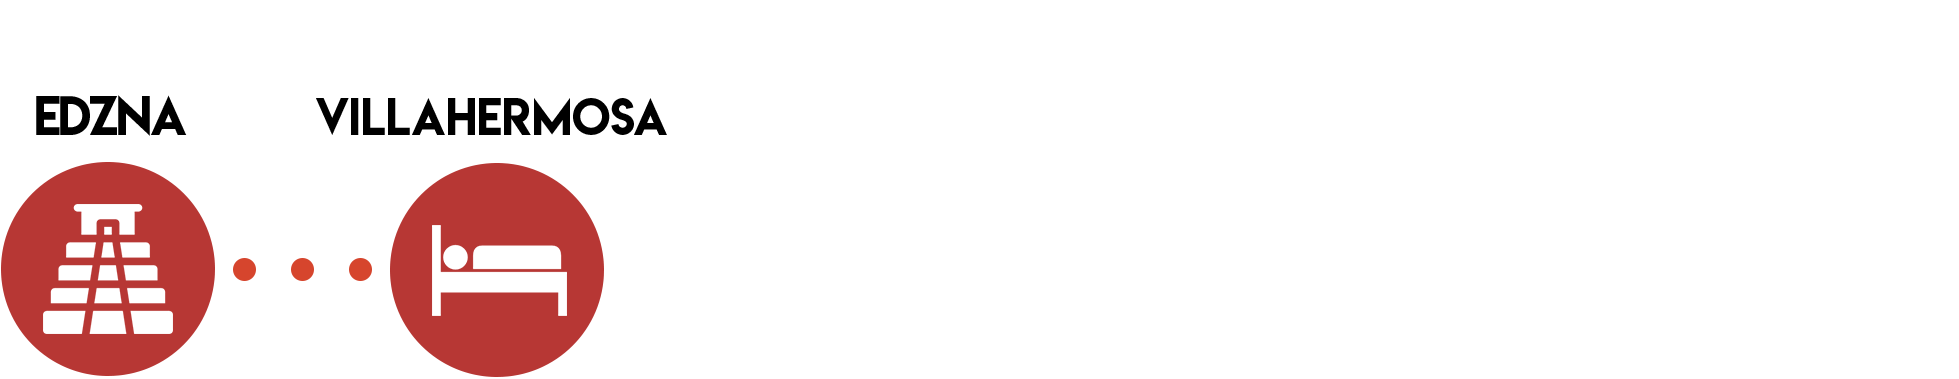 percorso-chiapaneco3